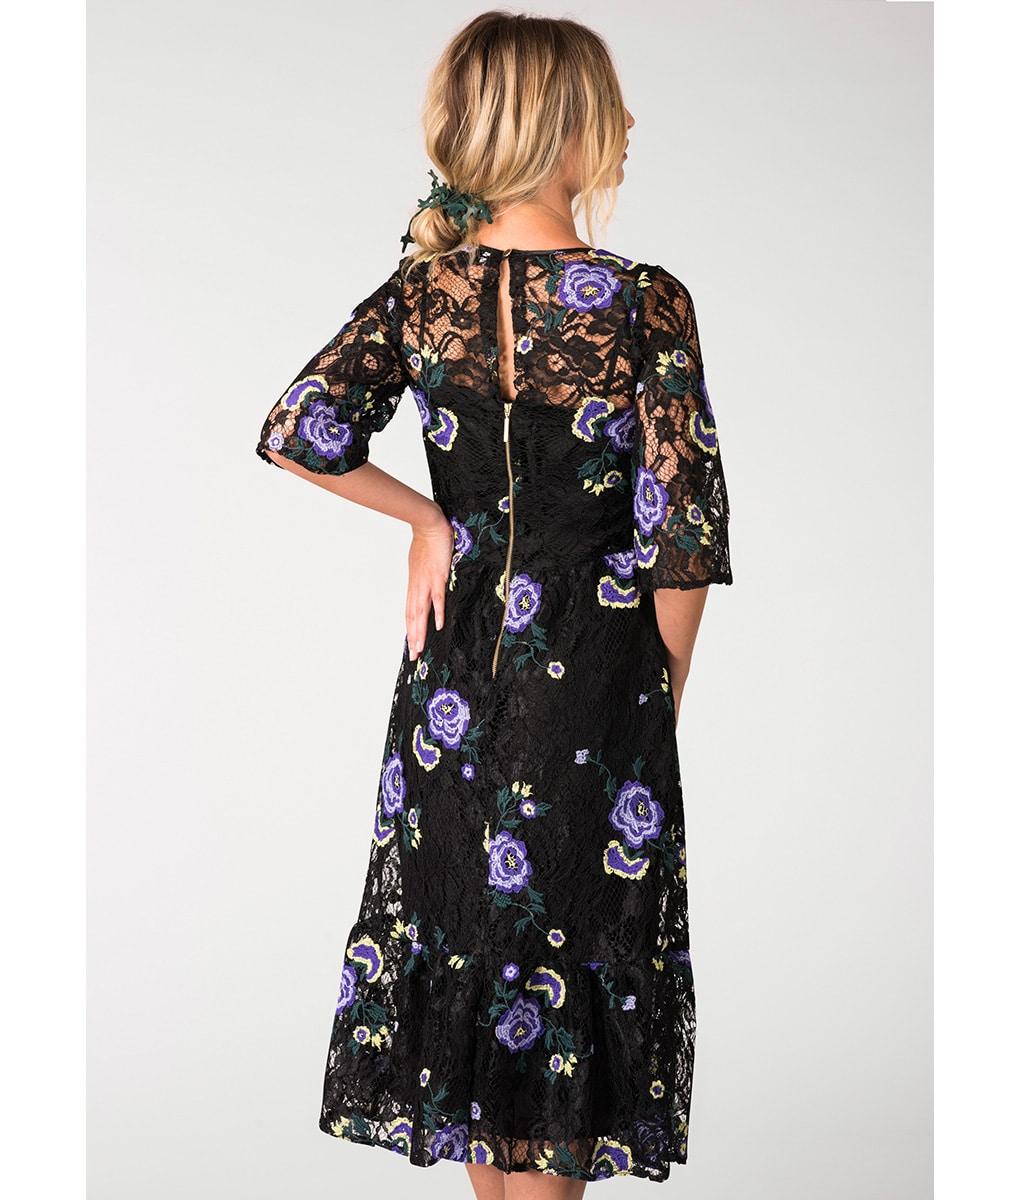 Alila-Lace-Frill-Hem-Embroidered-Midi-Dress-Closet-London